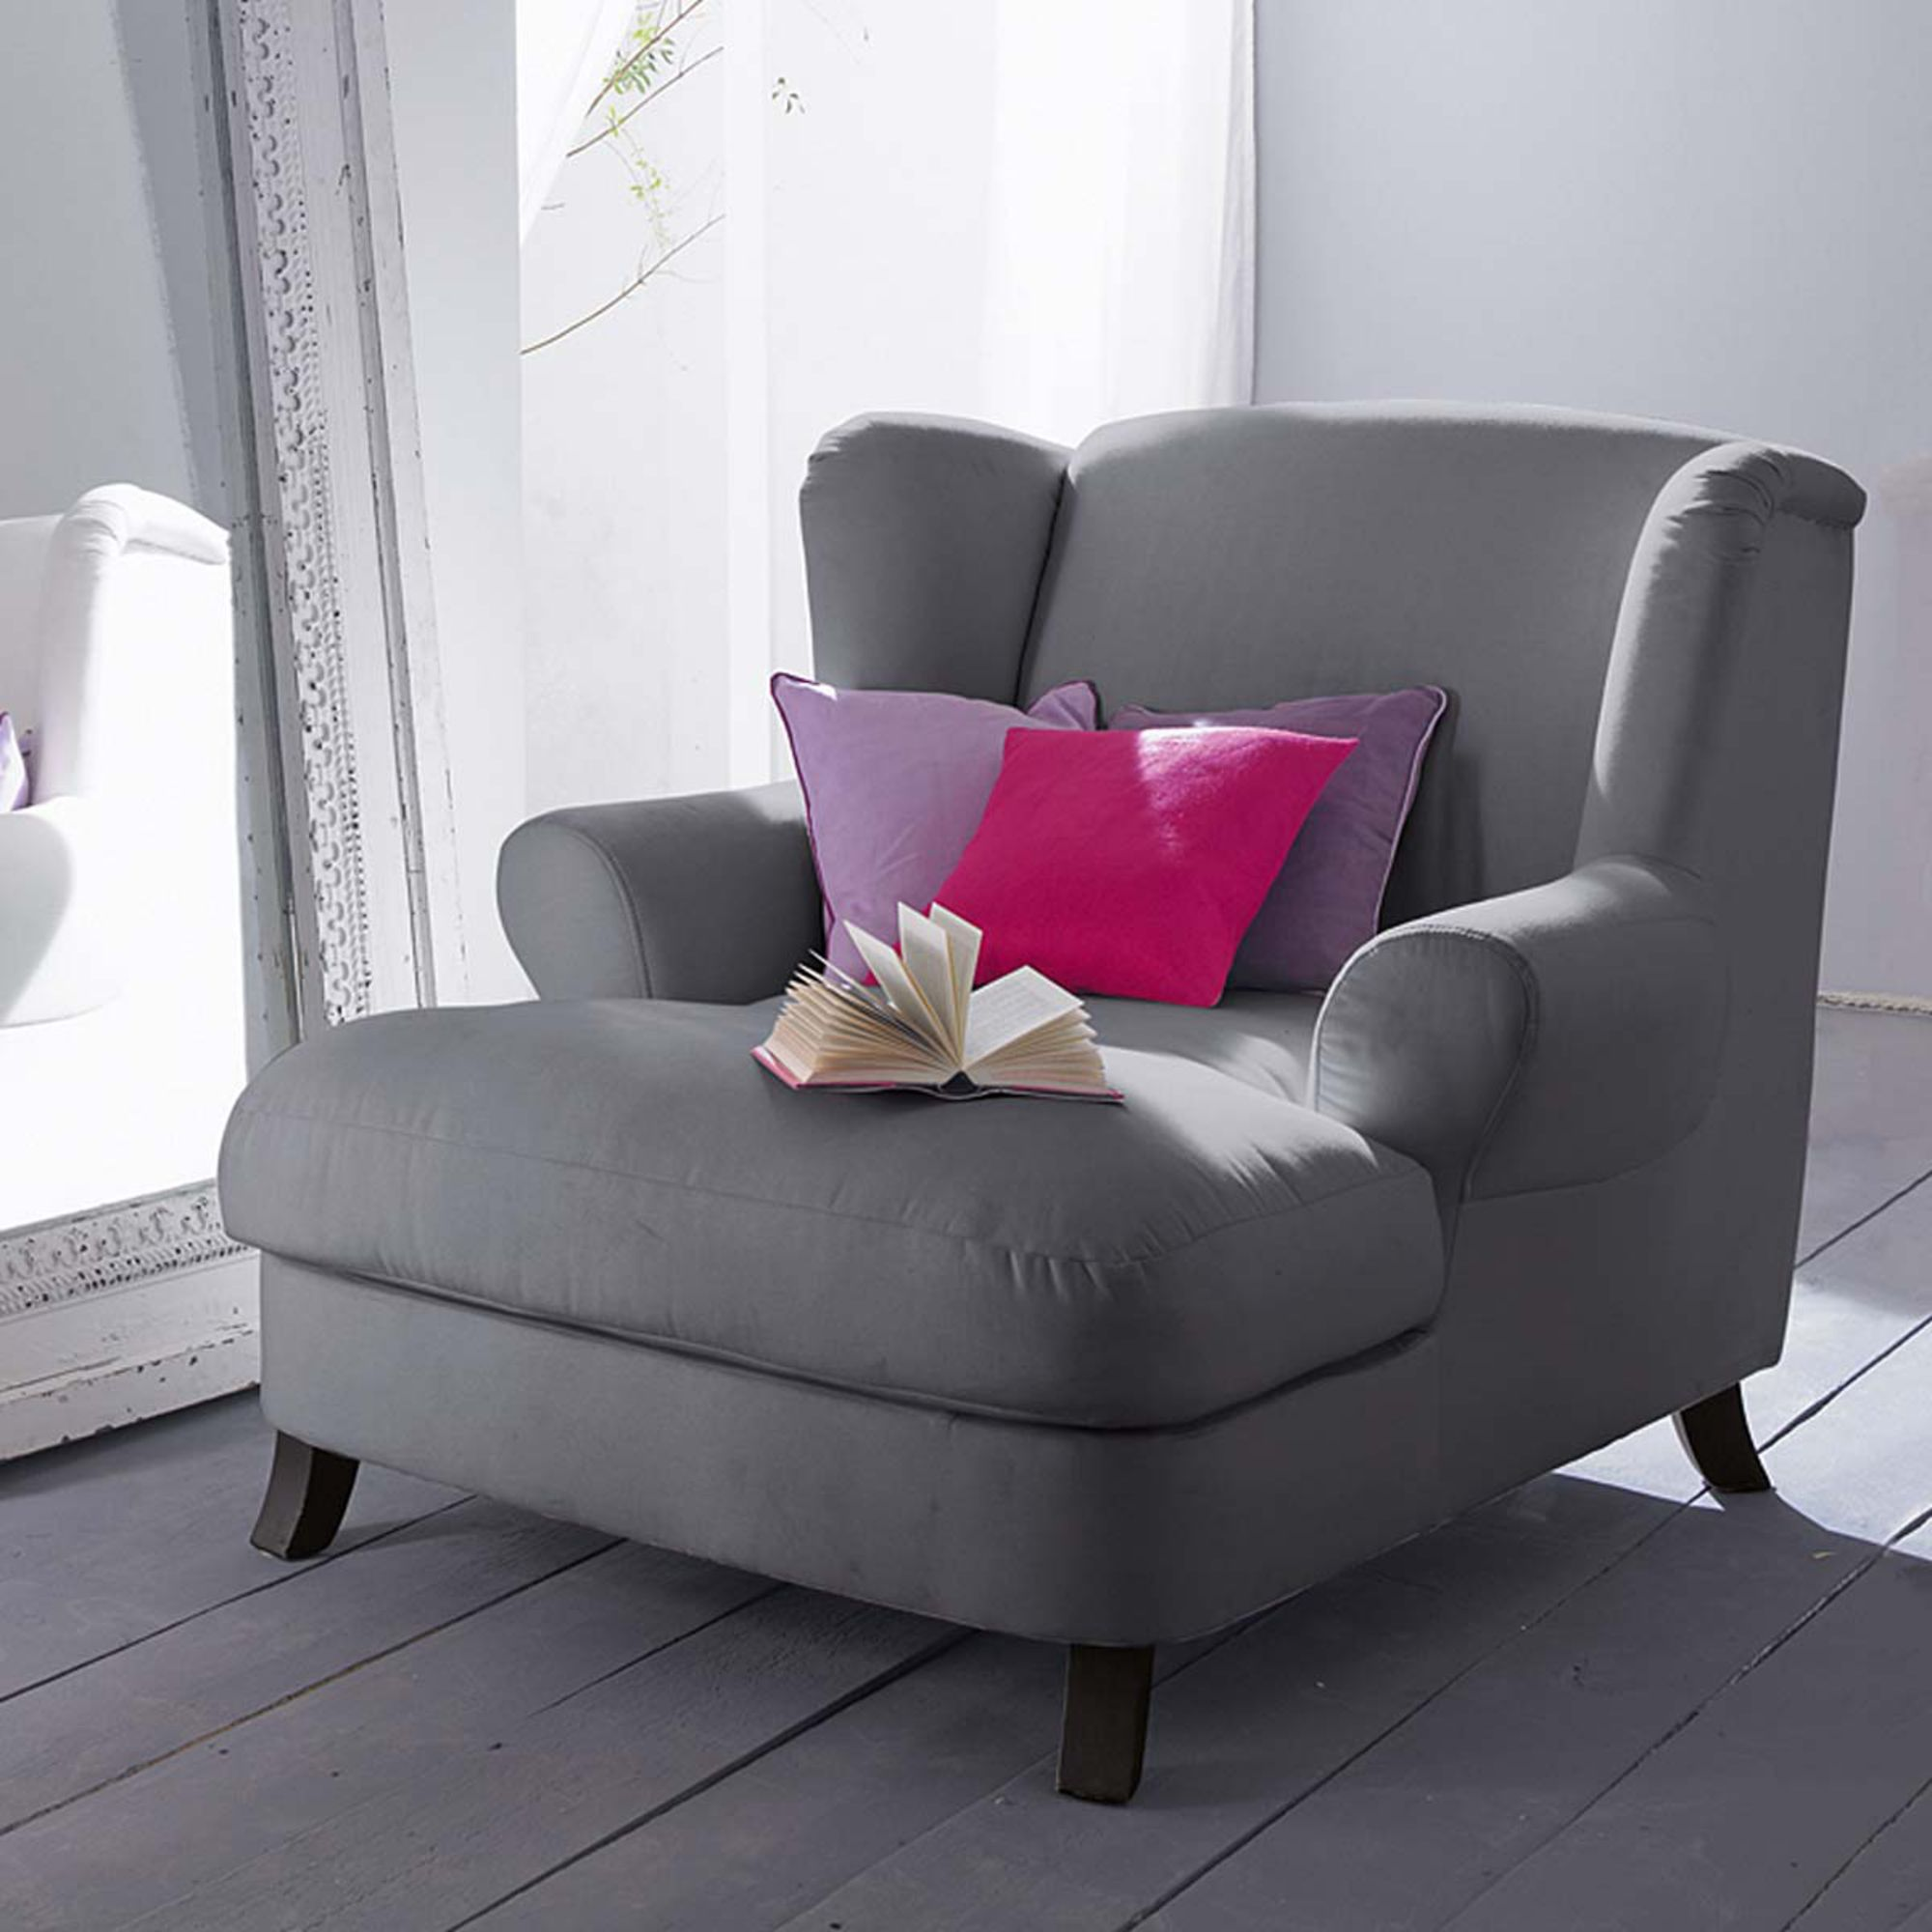 Ohrensessel In Stilvollem Grau Grey Wing Chair Impressionen